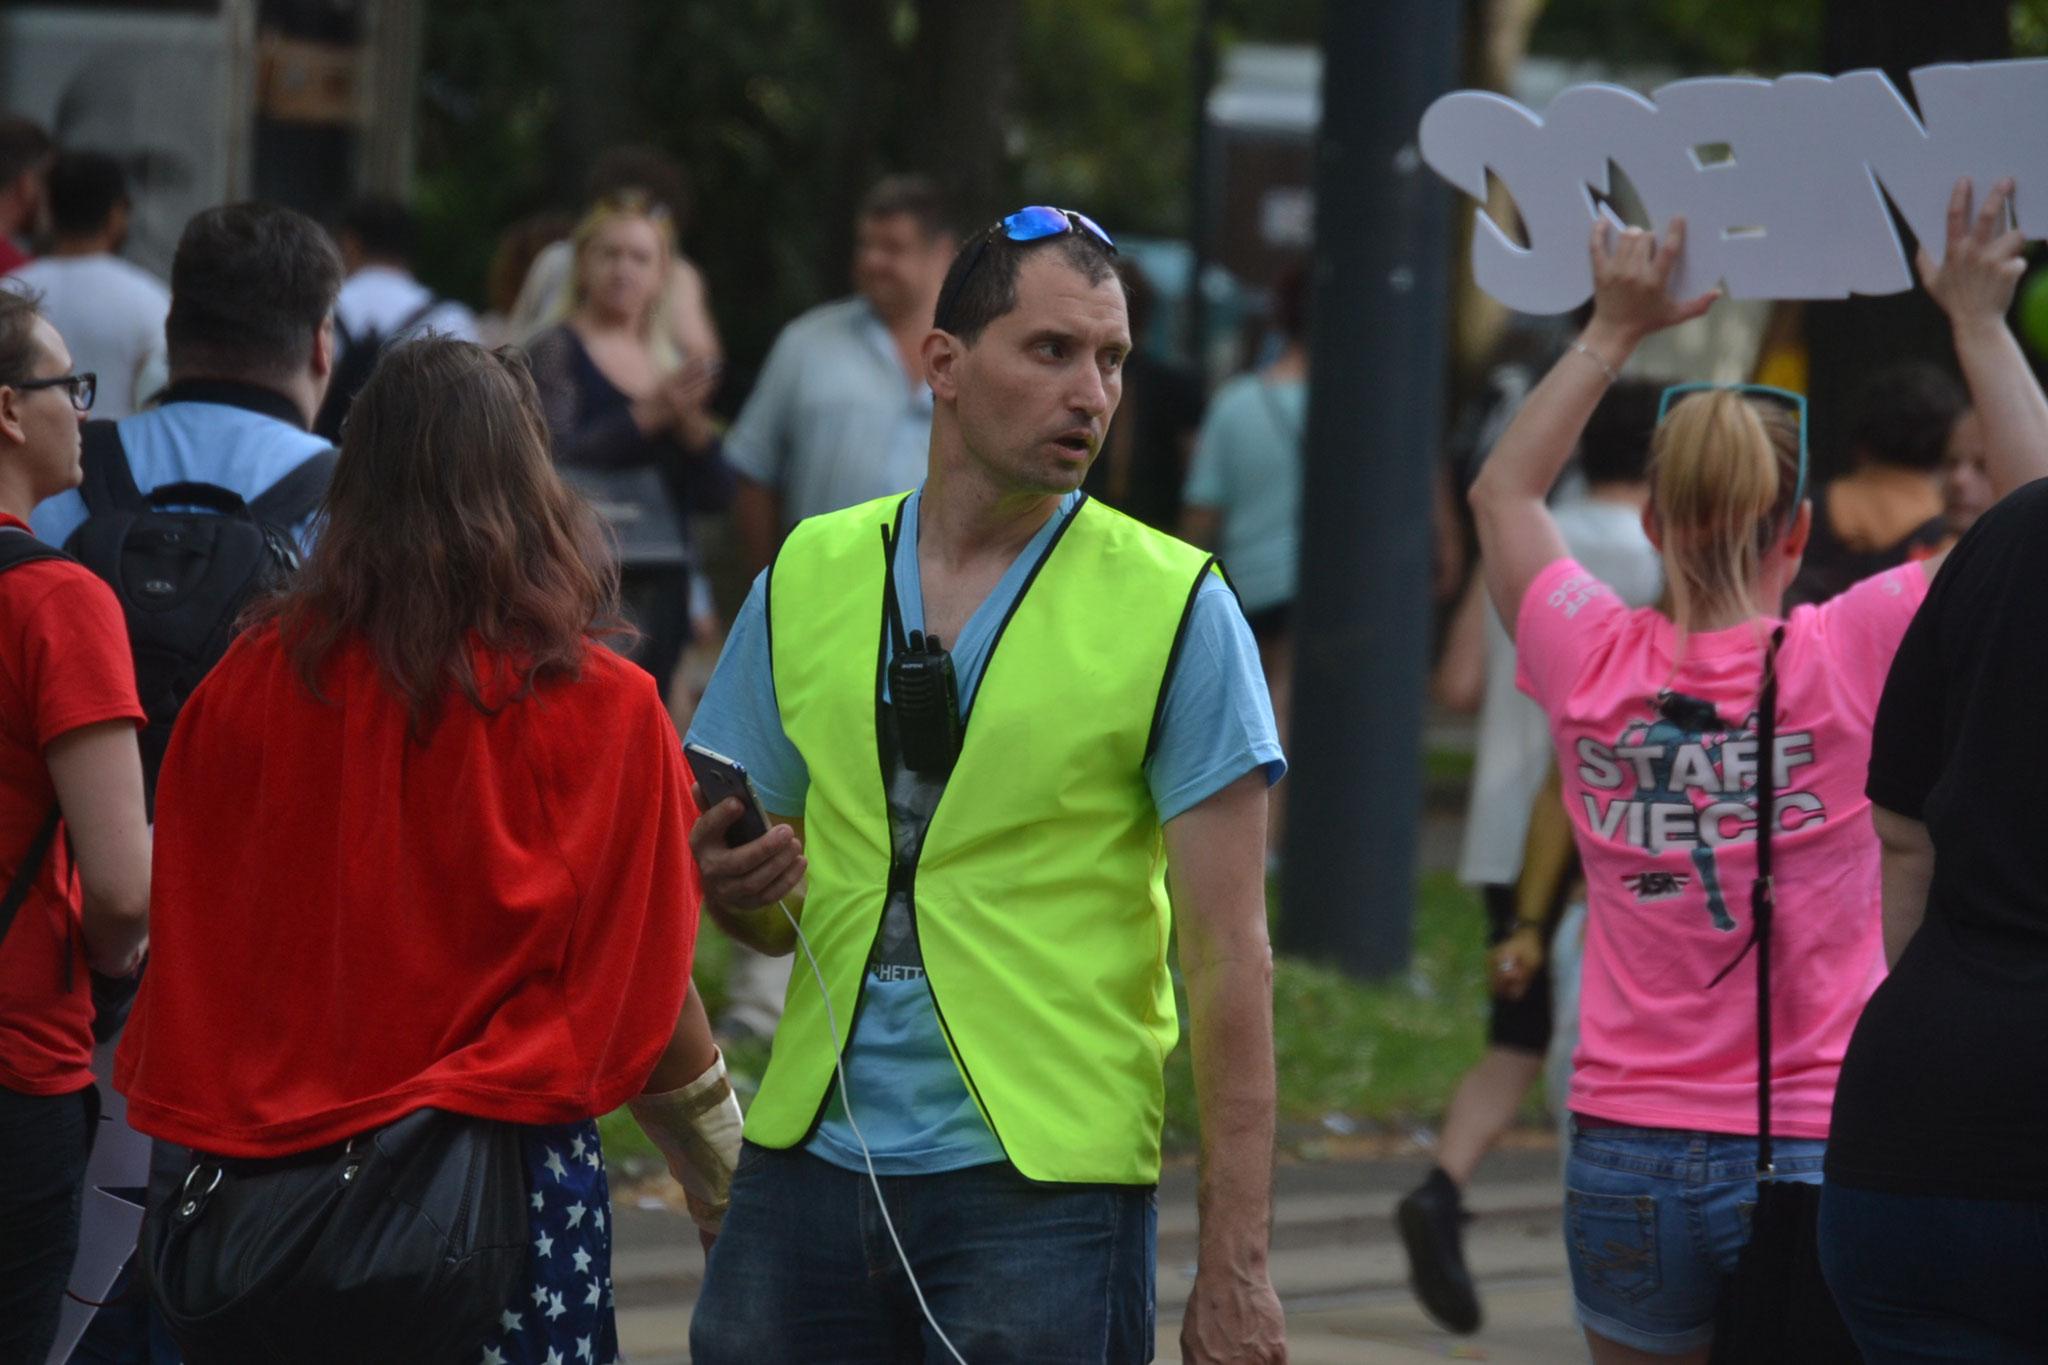 Begleitung Regenbogenparade 2017